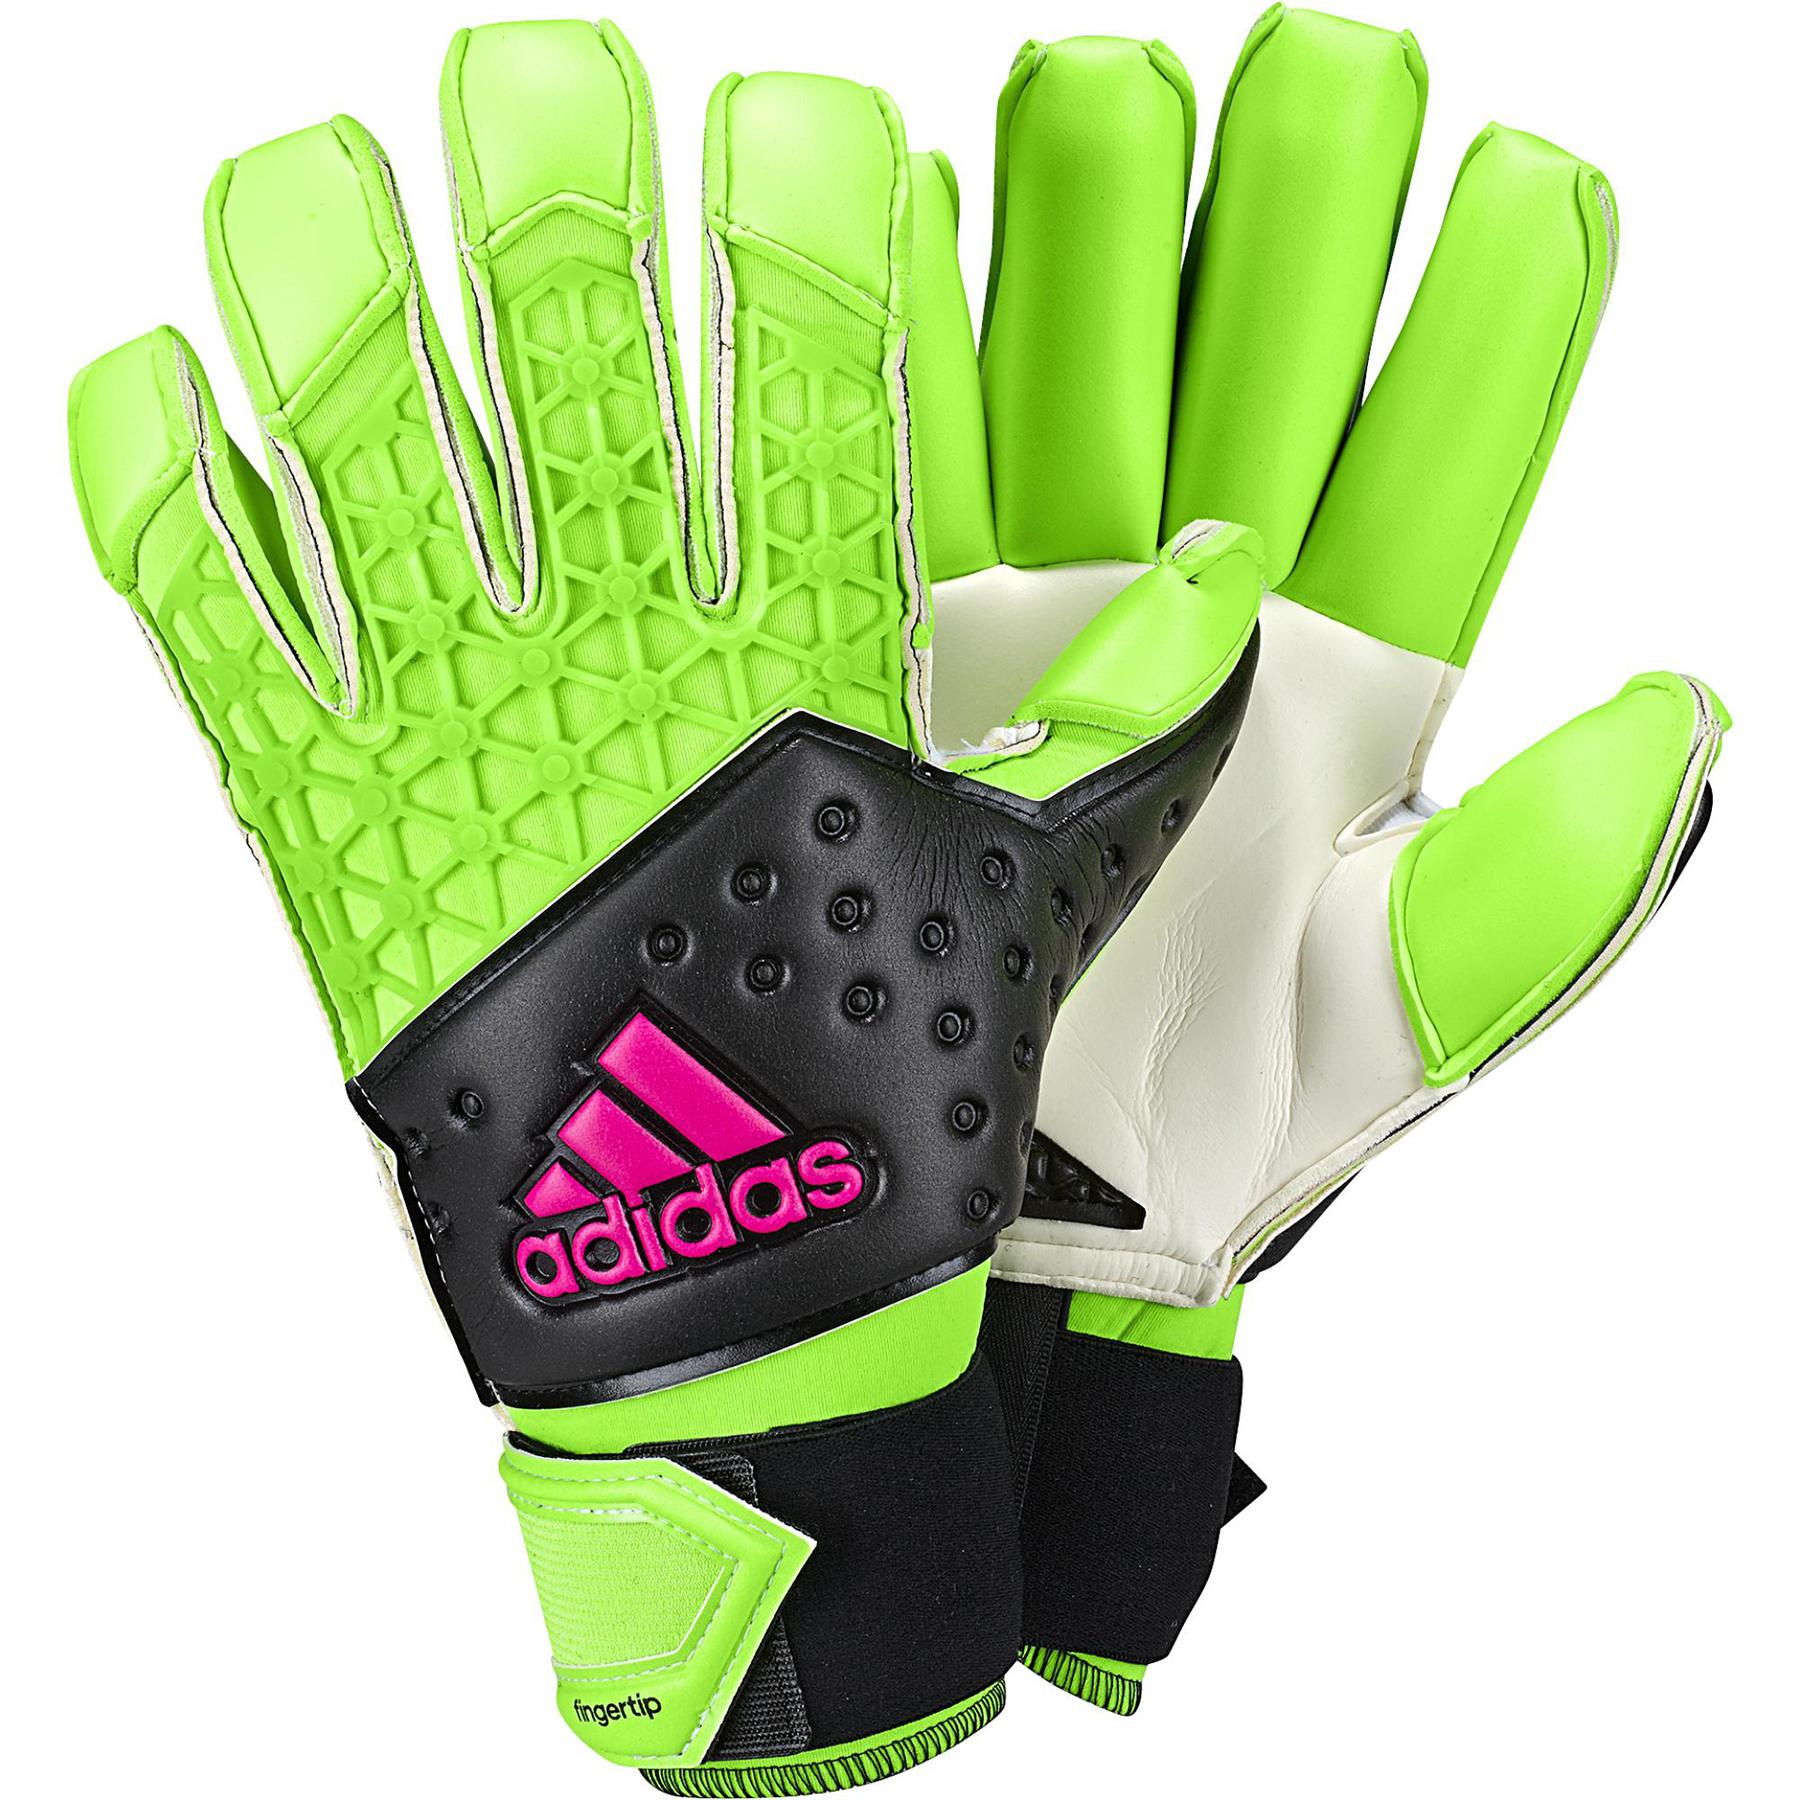 adidas Ace Zones FT Goalkeeper Gloves Green